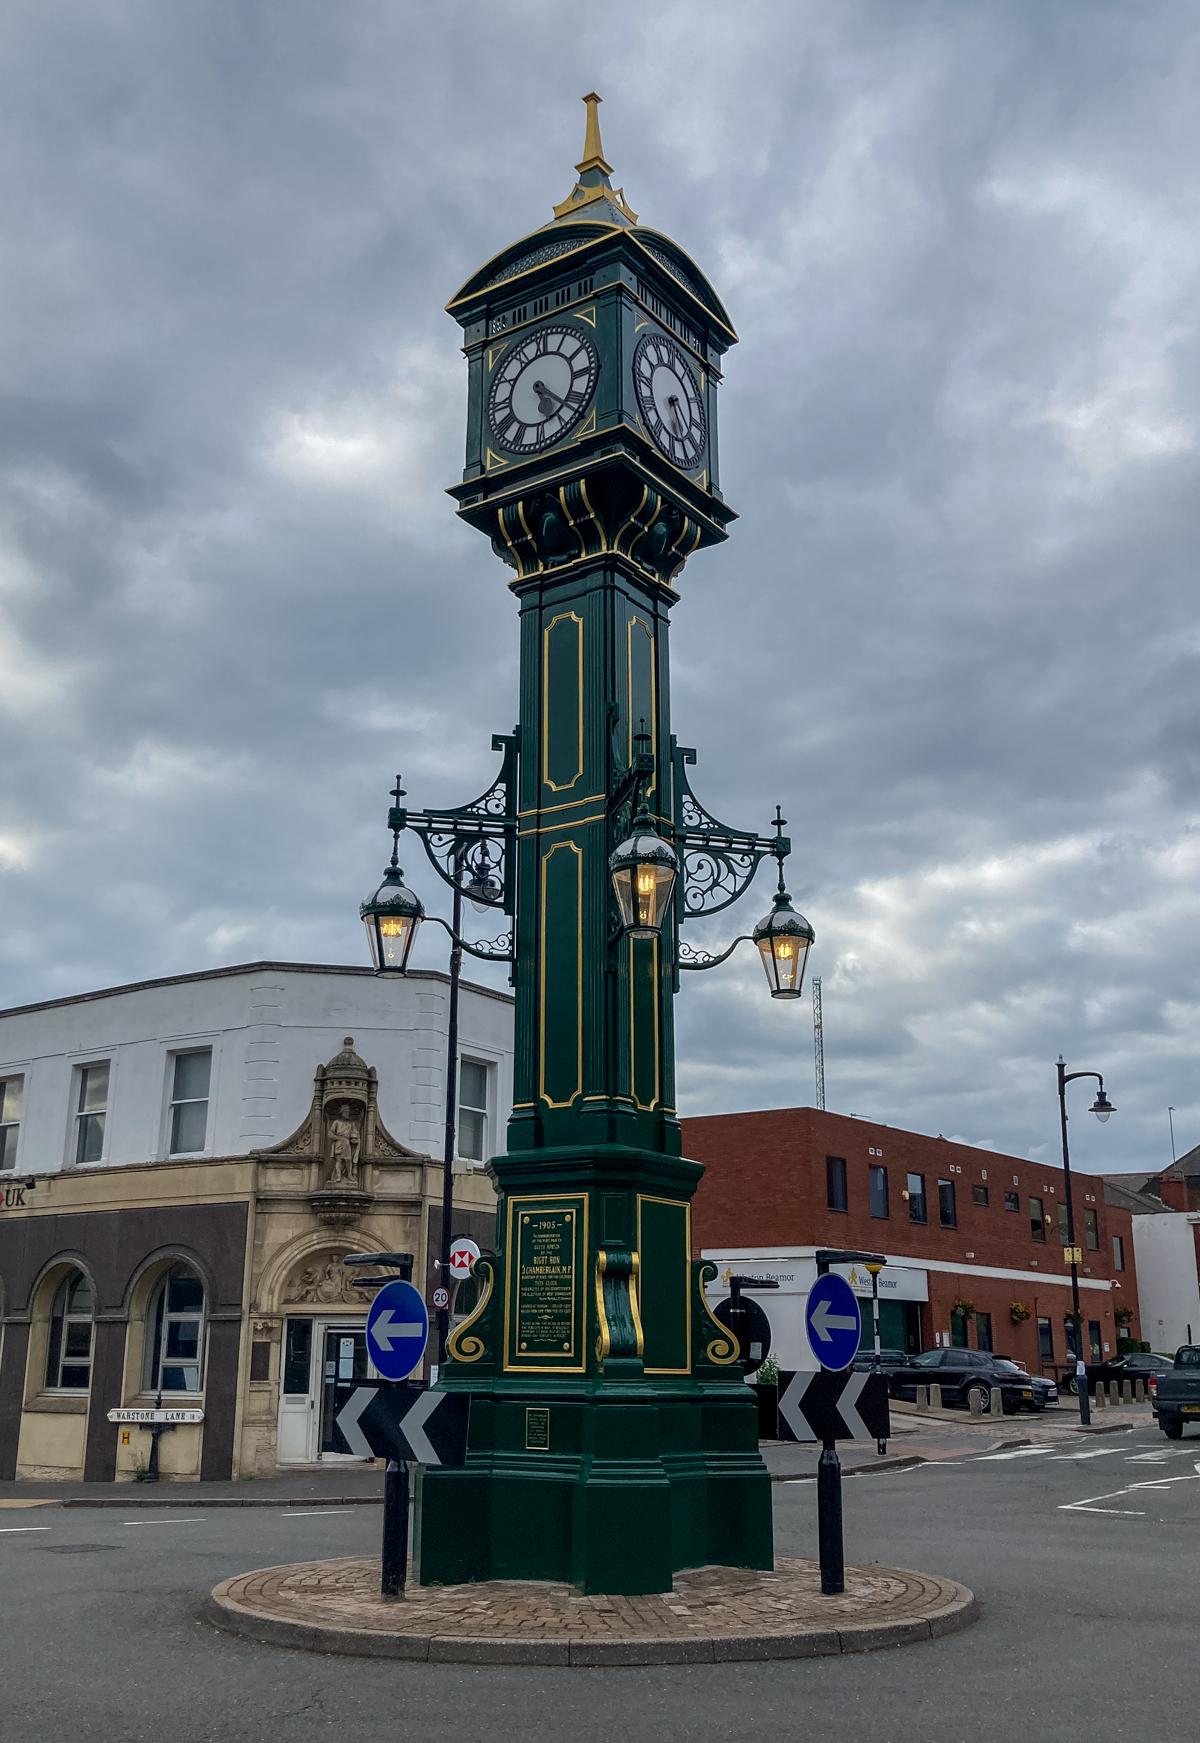 Tour d'horloge